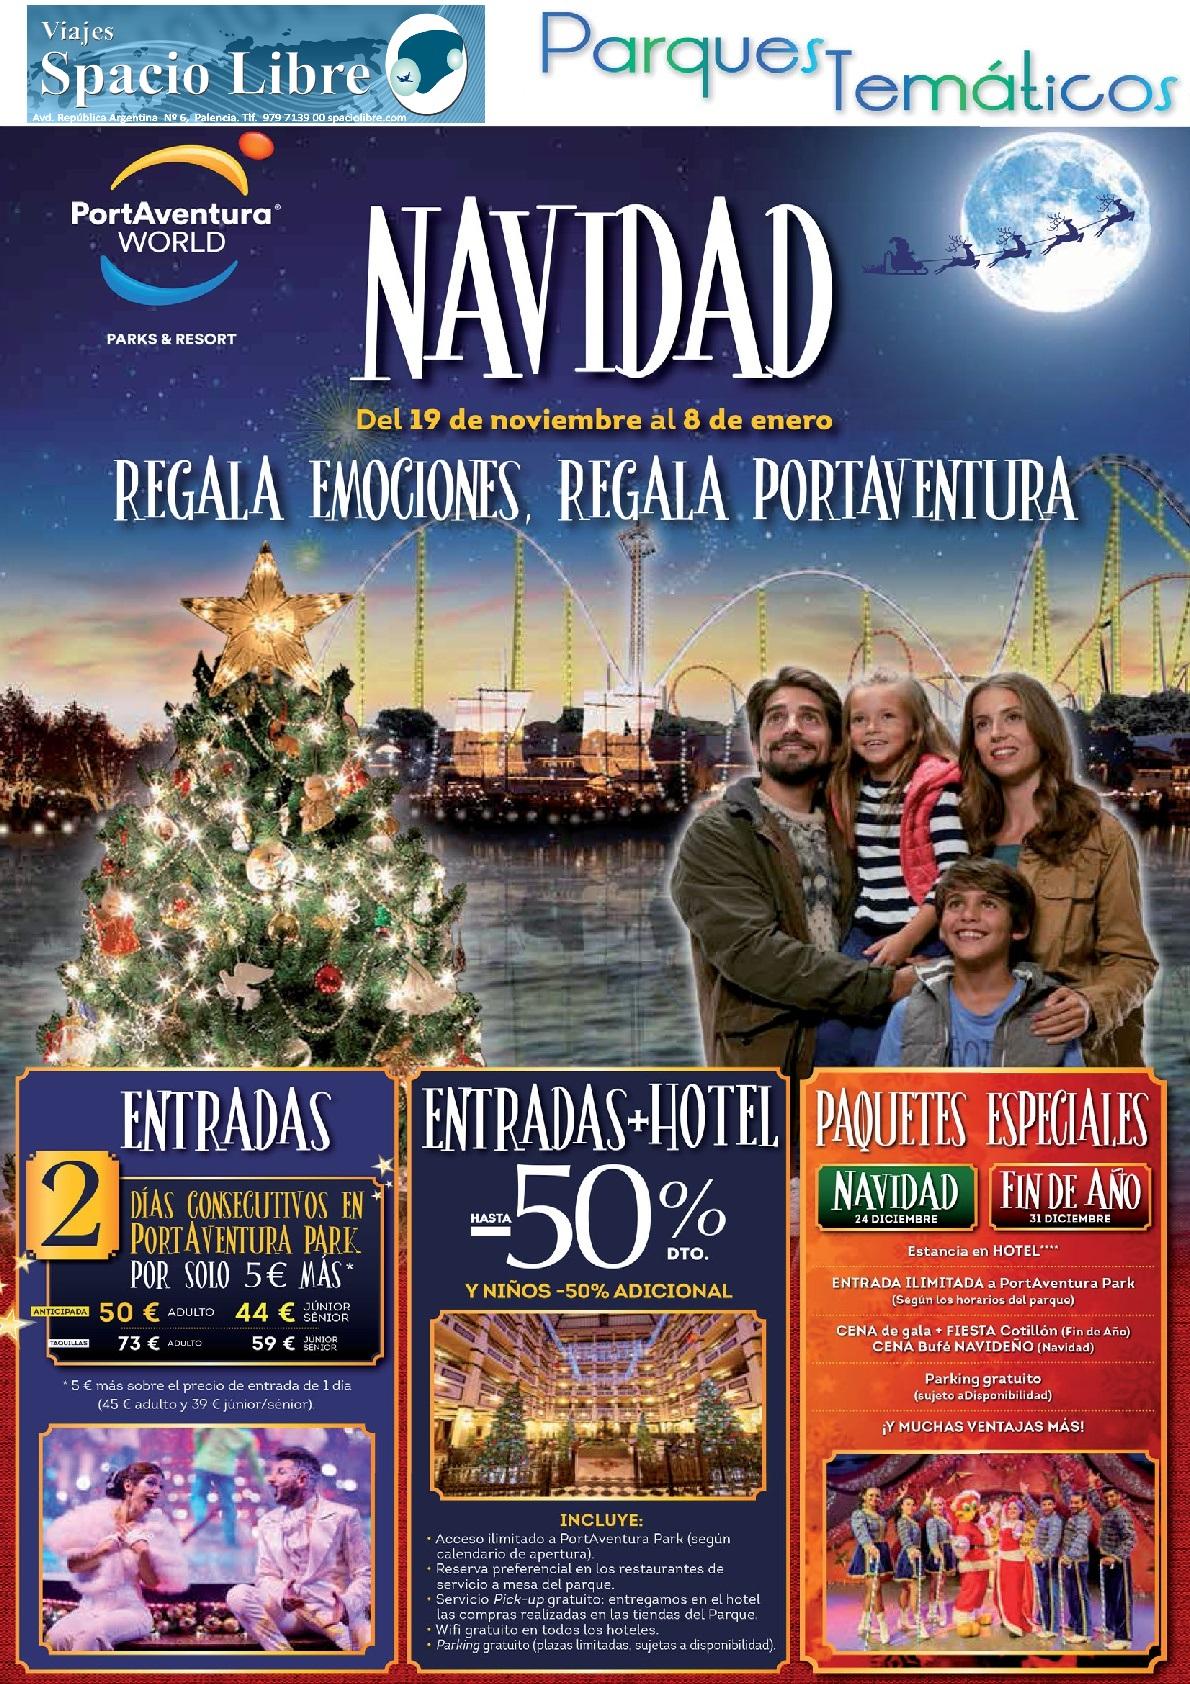 portaventura-navidad-del-19-11-al-08-01-16